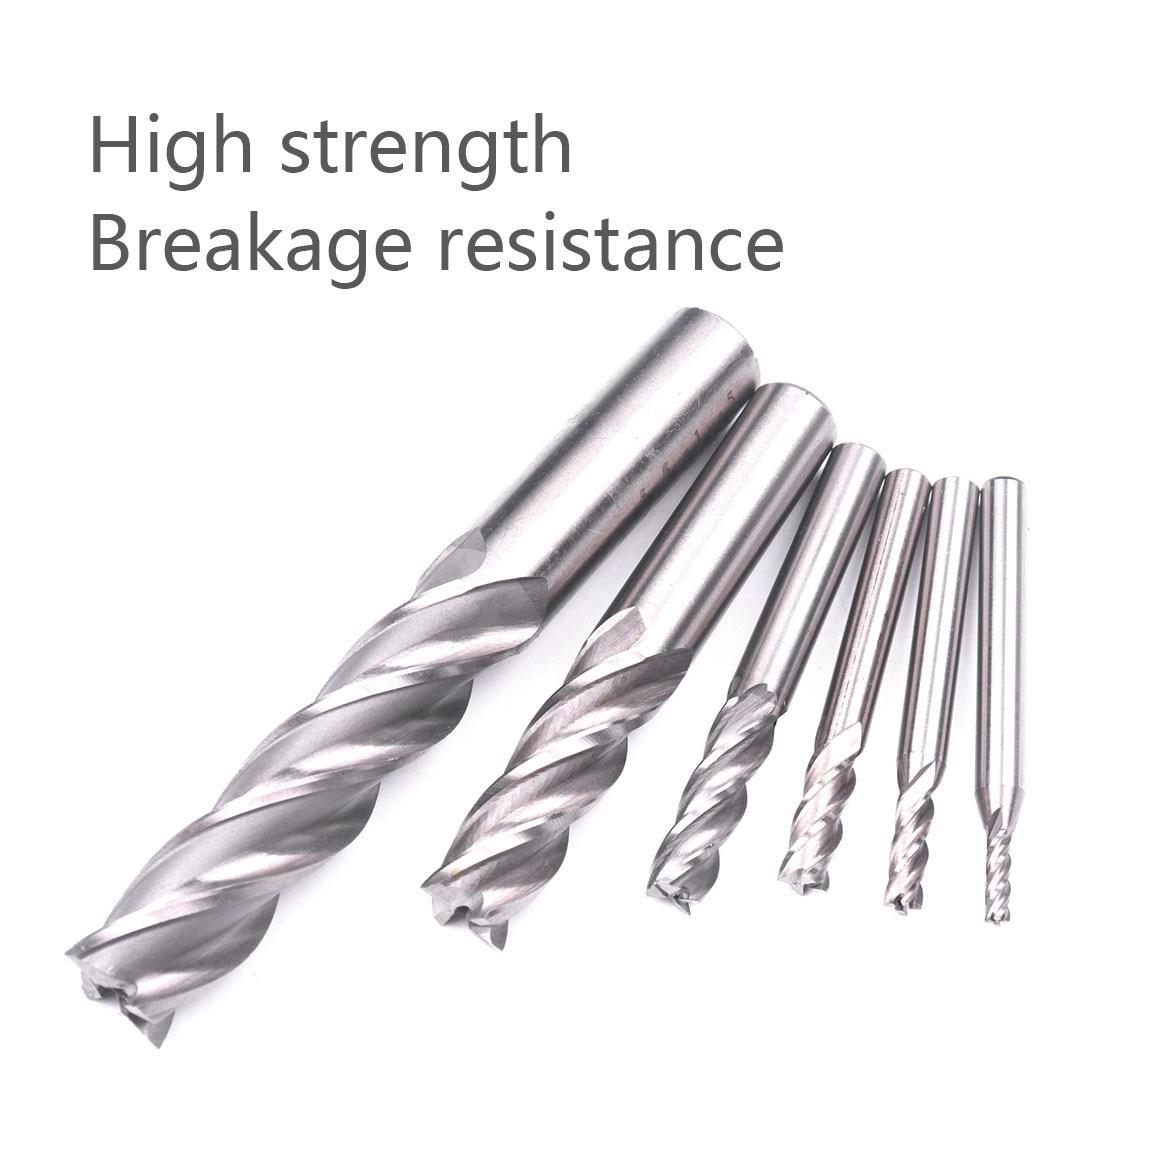 6pcs HSS Endmill Straight Shank 4 Flute HRC63-65 Metal Cutter End Mill CNC Milling Cutter Machine Tools